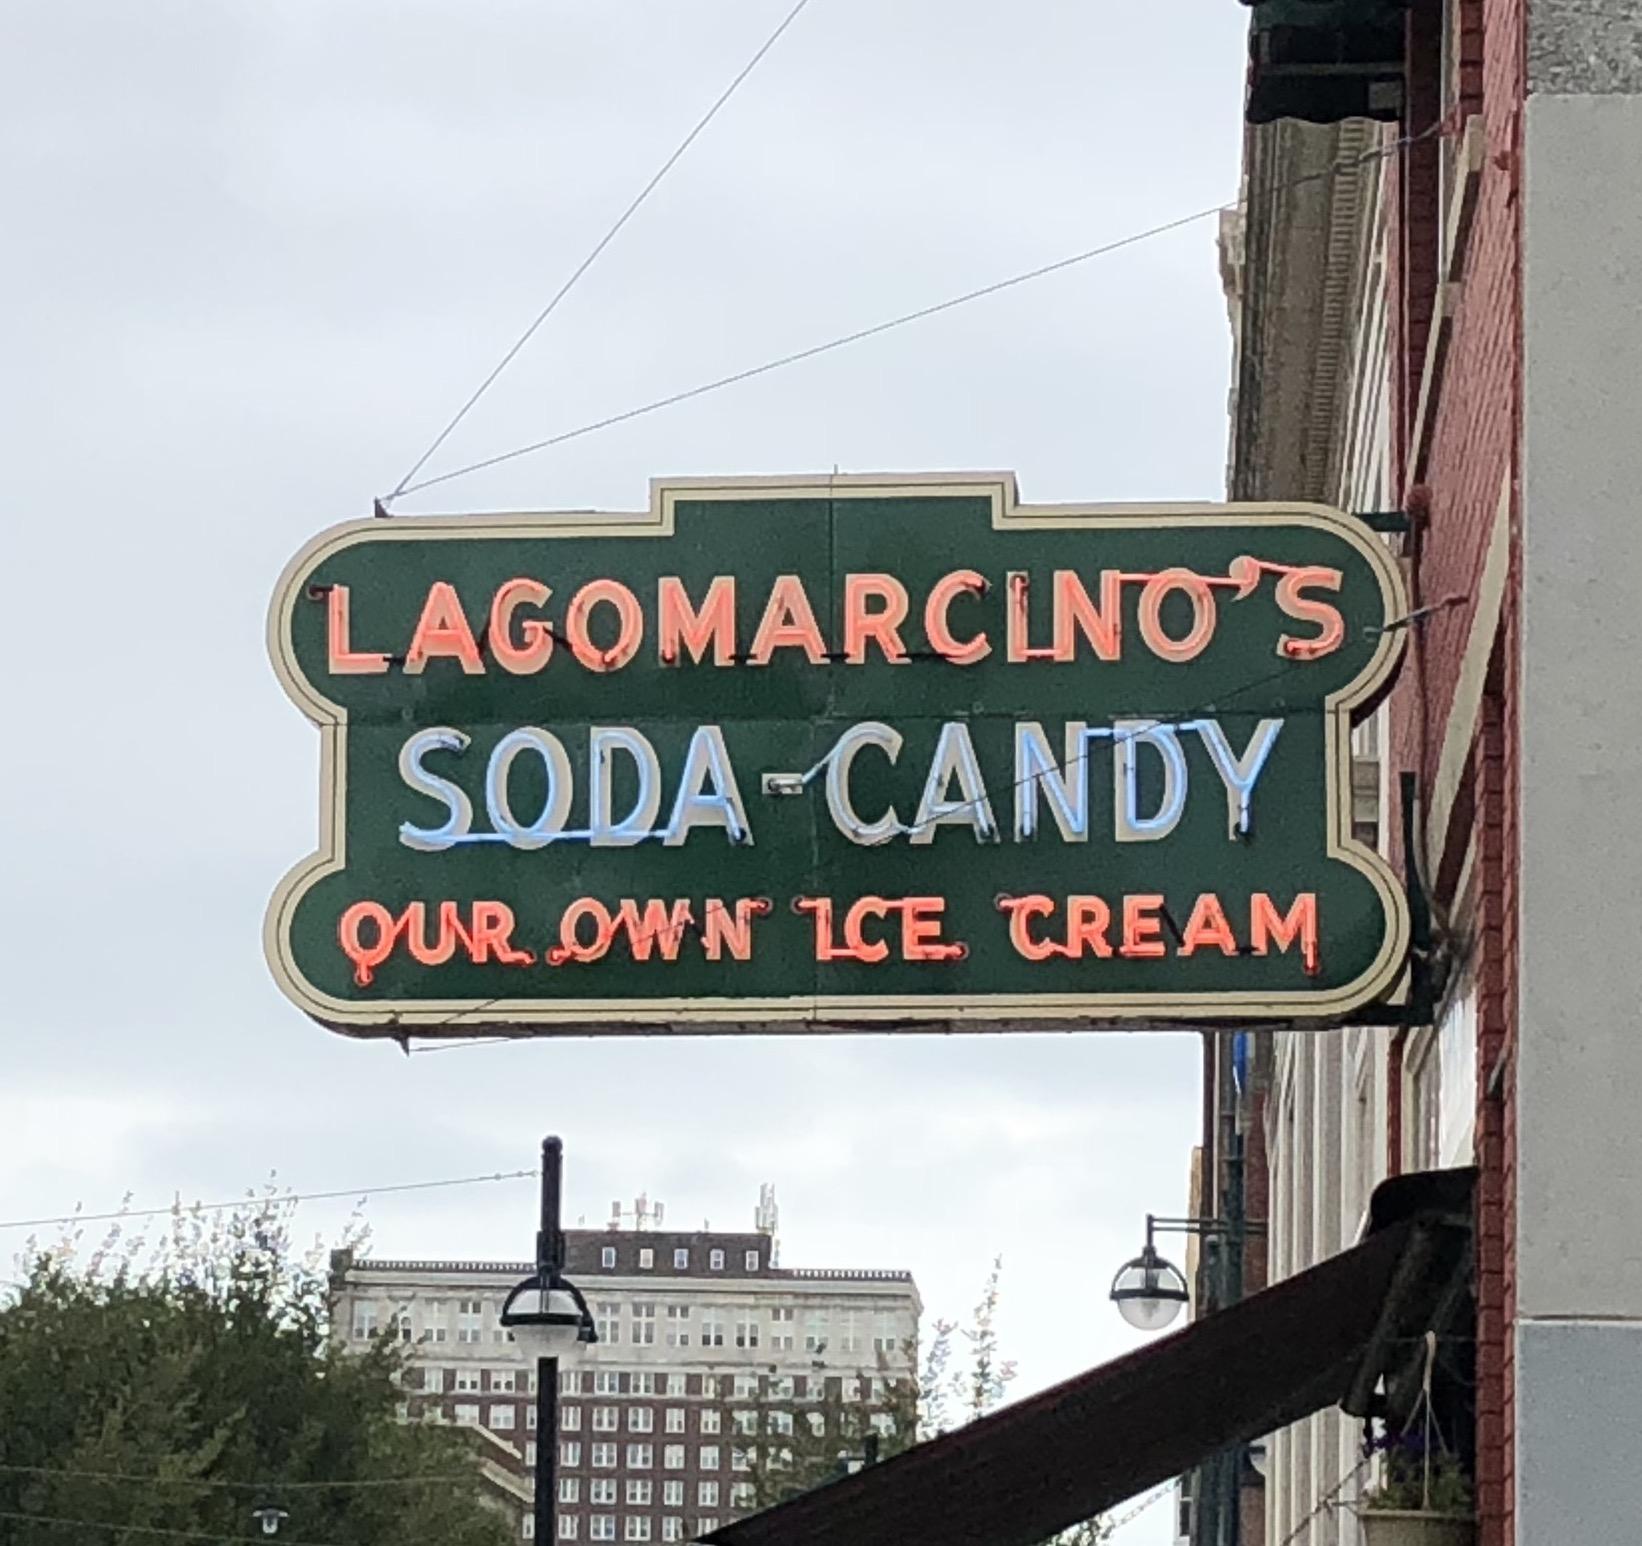 Lagomarcino's Confectionery Soda shop road trip 4chion lifestyle